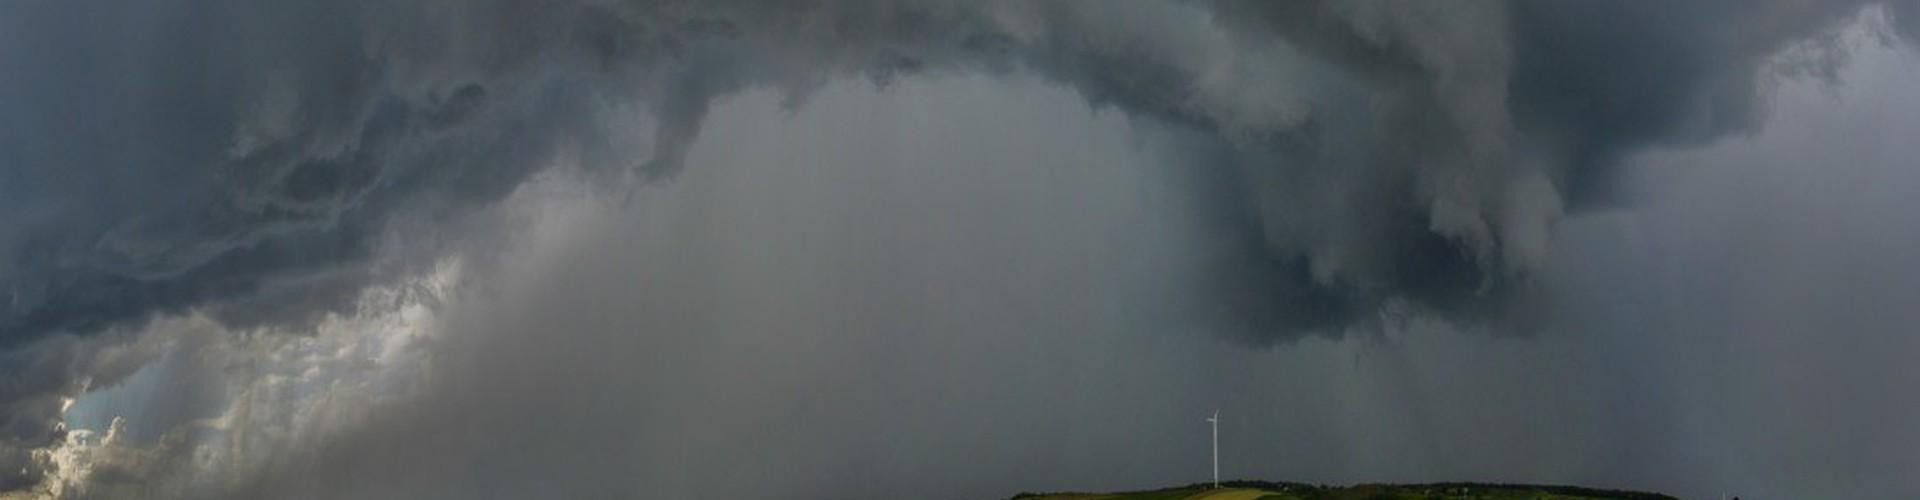 Storm in the Weinviertel, Lower Austria (Credit: Peter Huber, distributed via imaggeo.egu.eu)